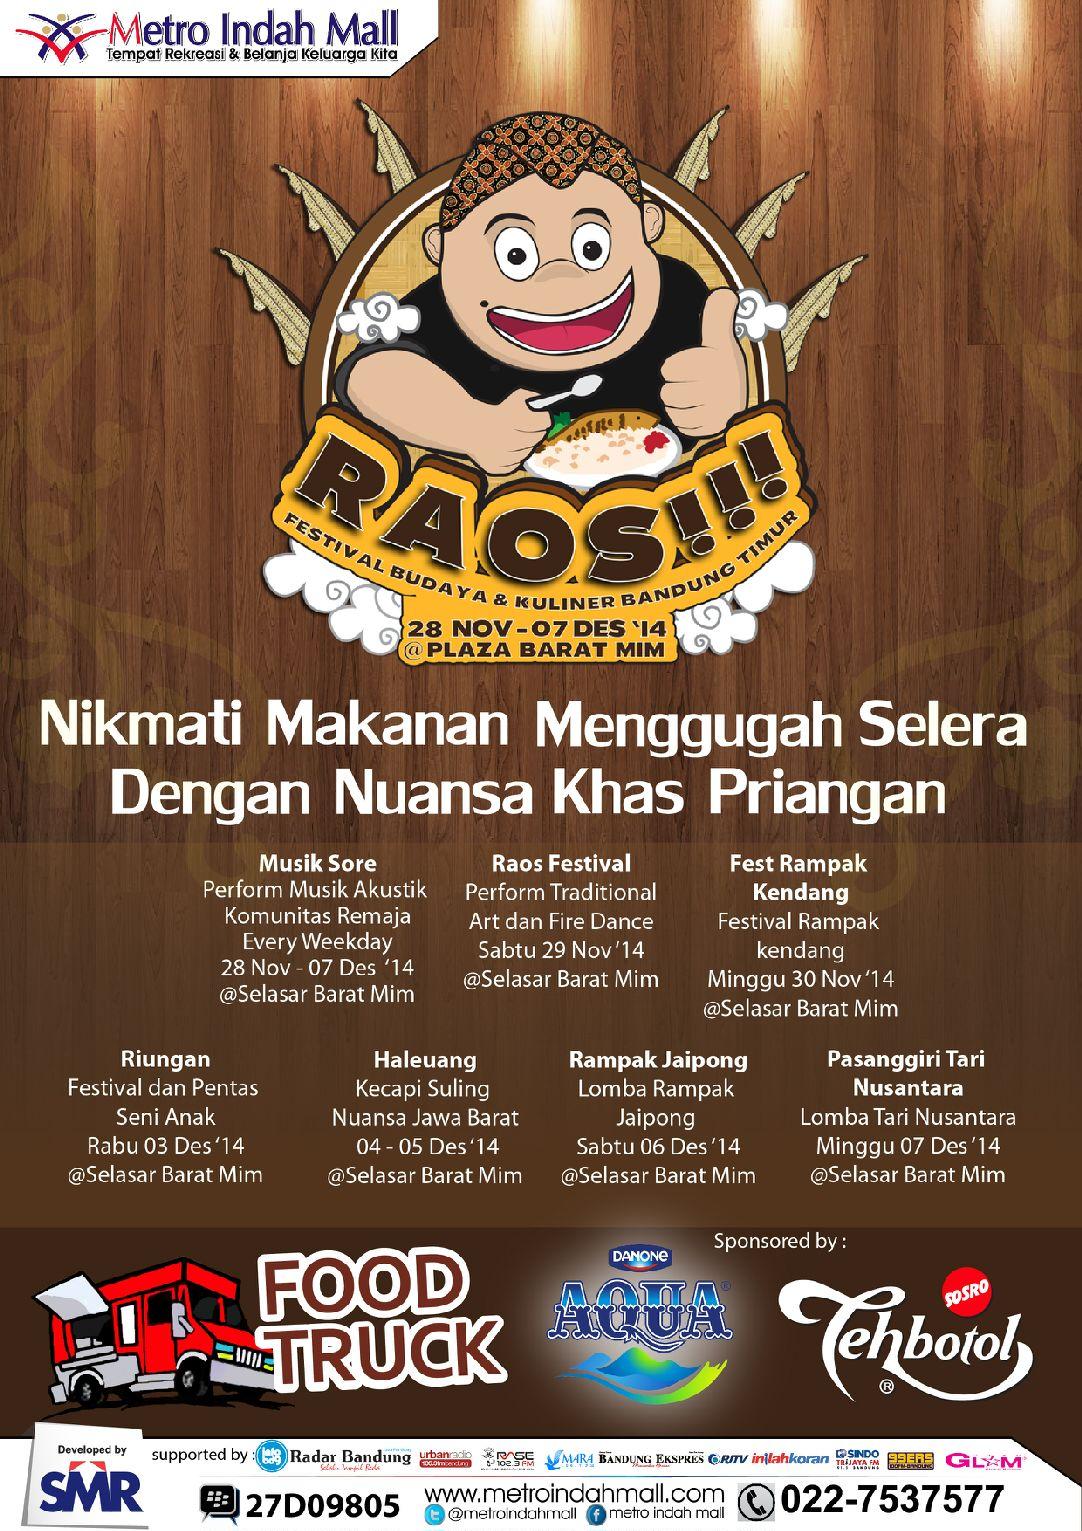 Raos Festival Budaya Kuliner Bandung Timur Infobdg Com